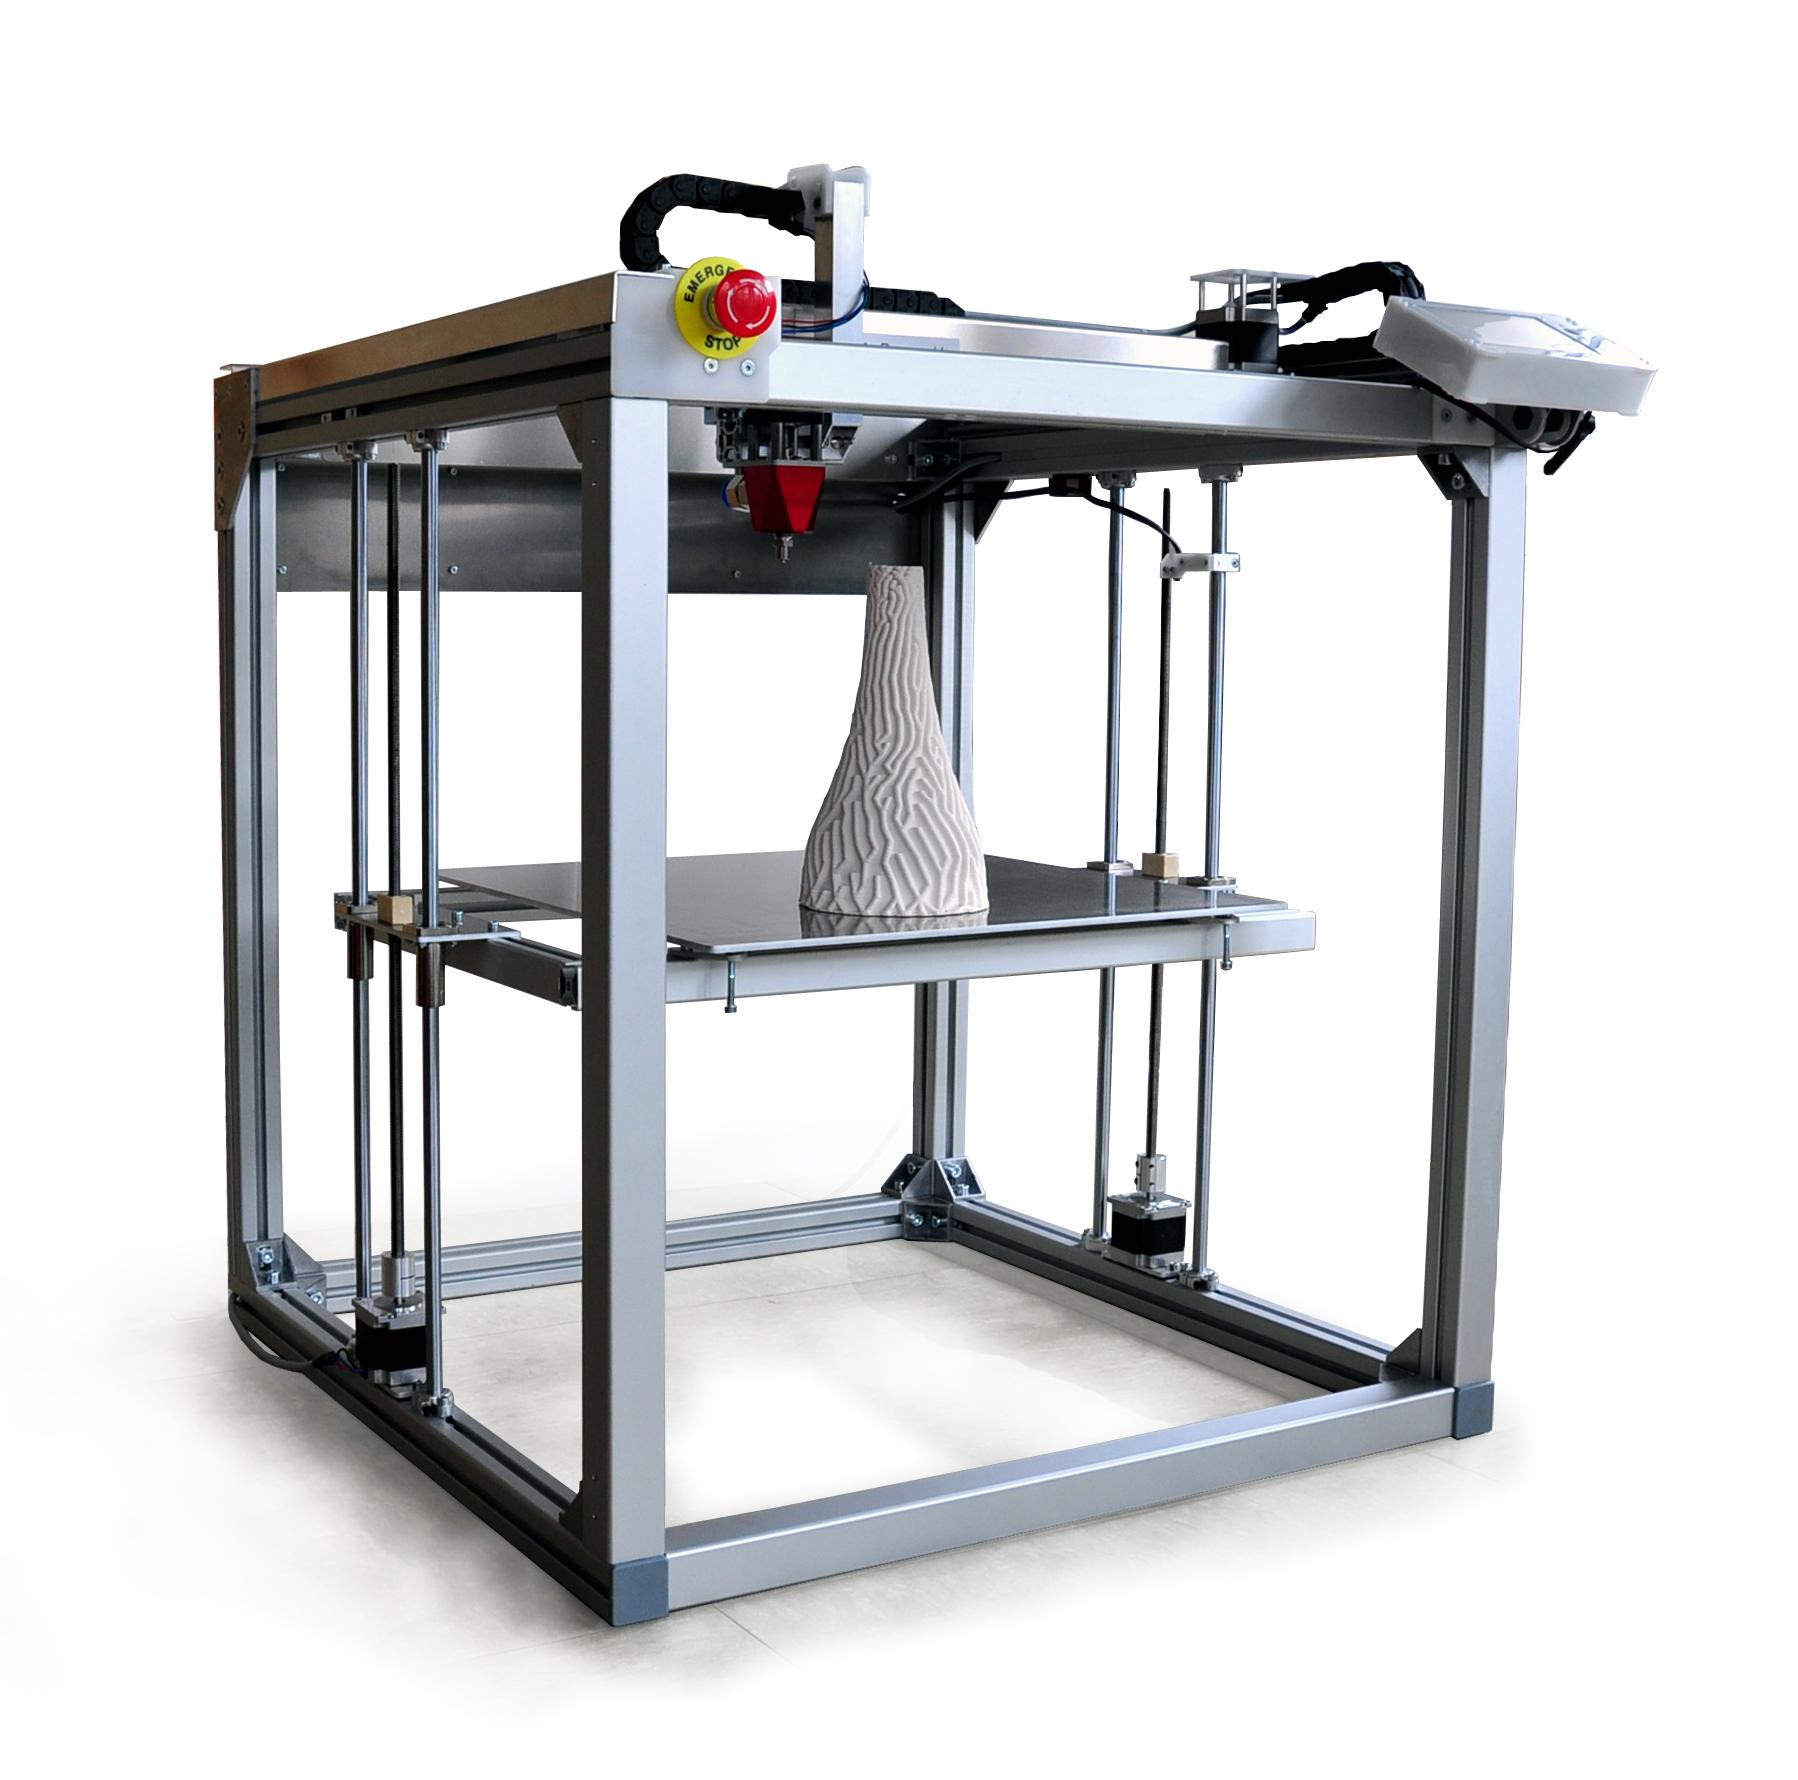 StoneFlower 3.1 multimaterial ceramic 3d printer